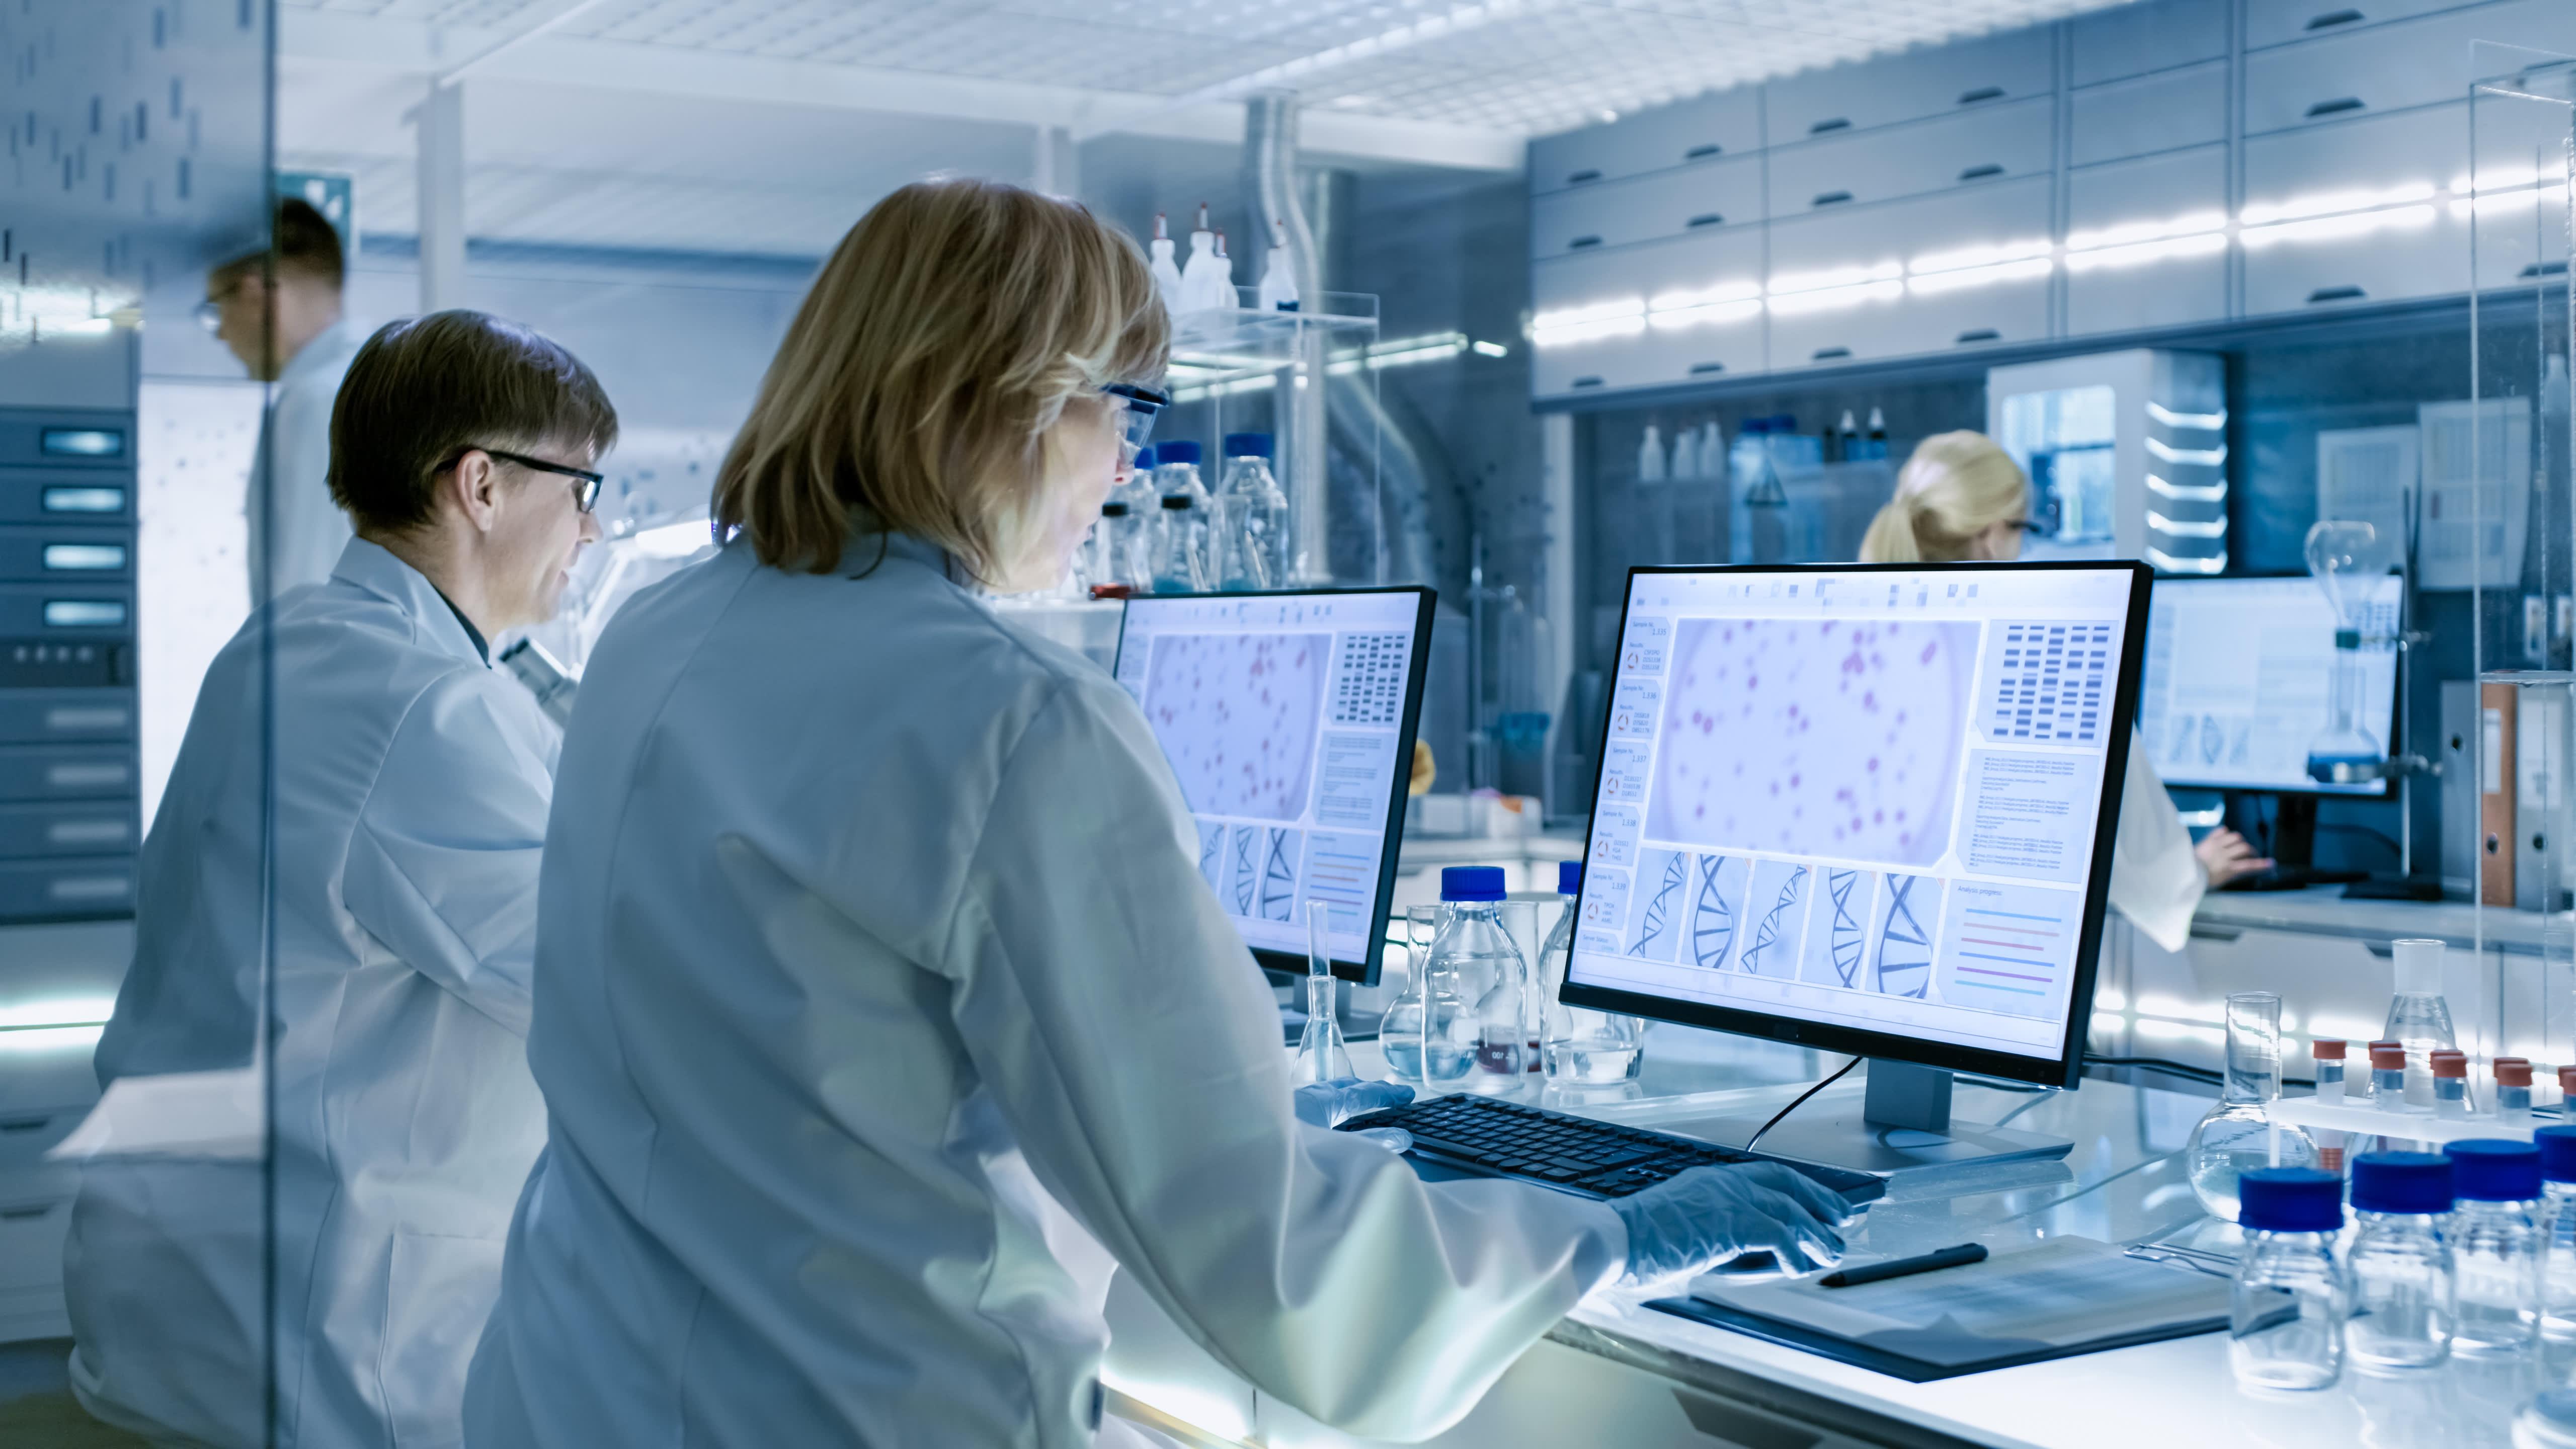 For $600 Veritas Genetics sequences 6 4 billion letters of